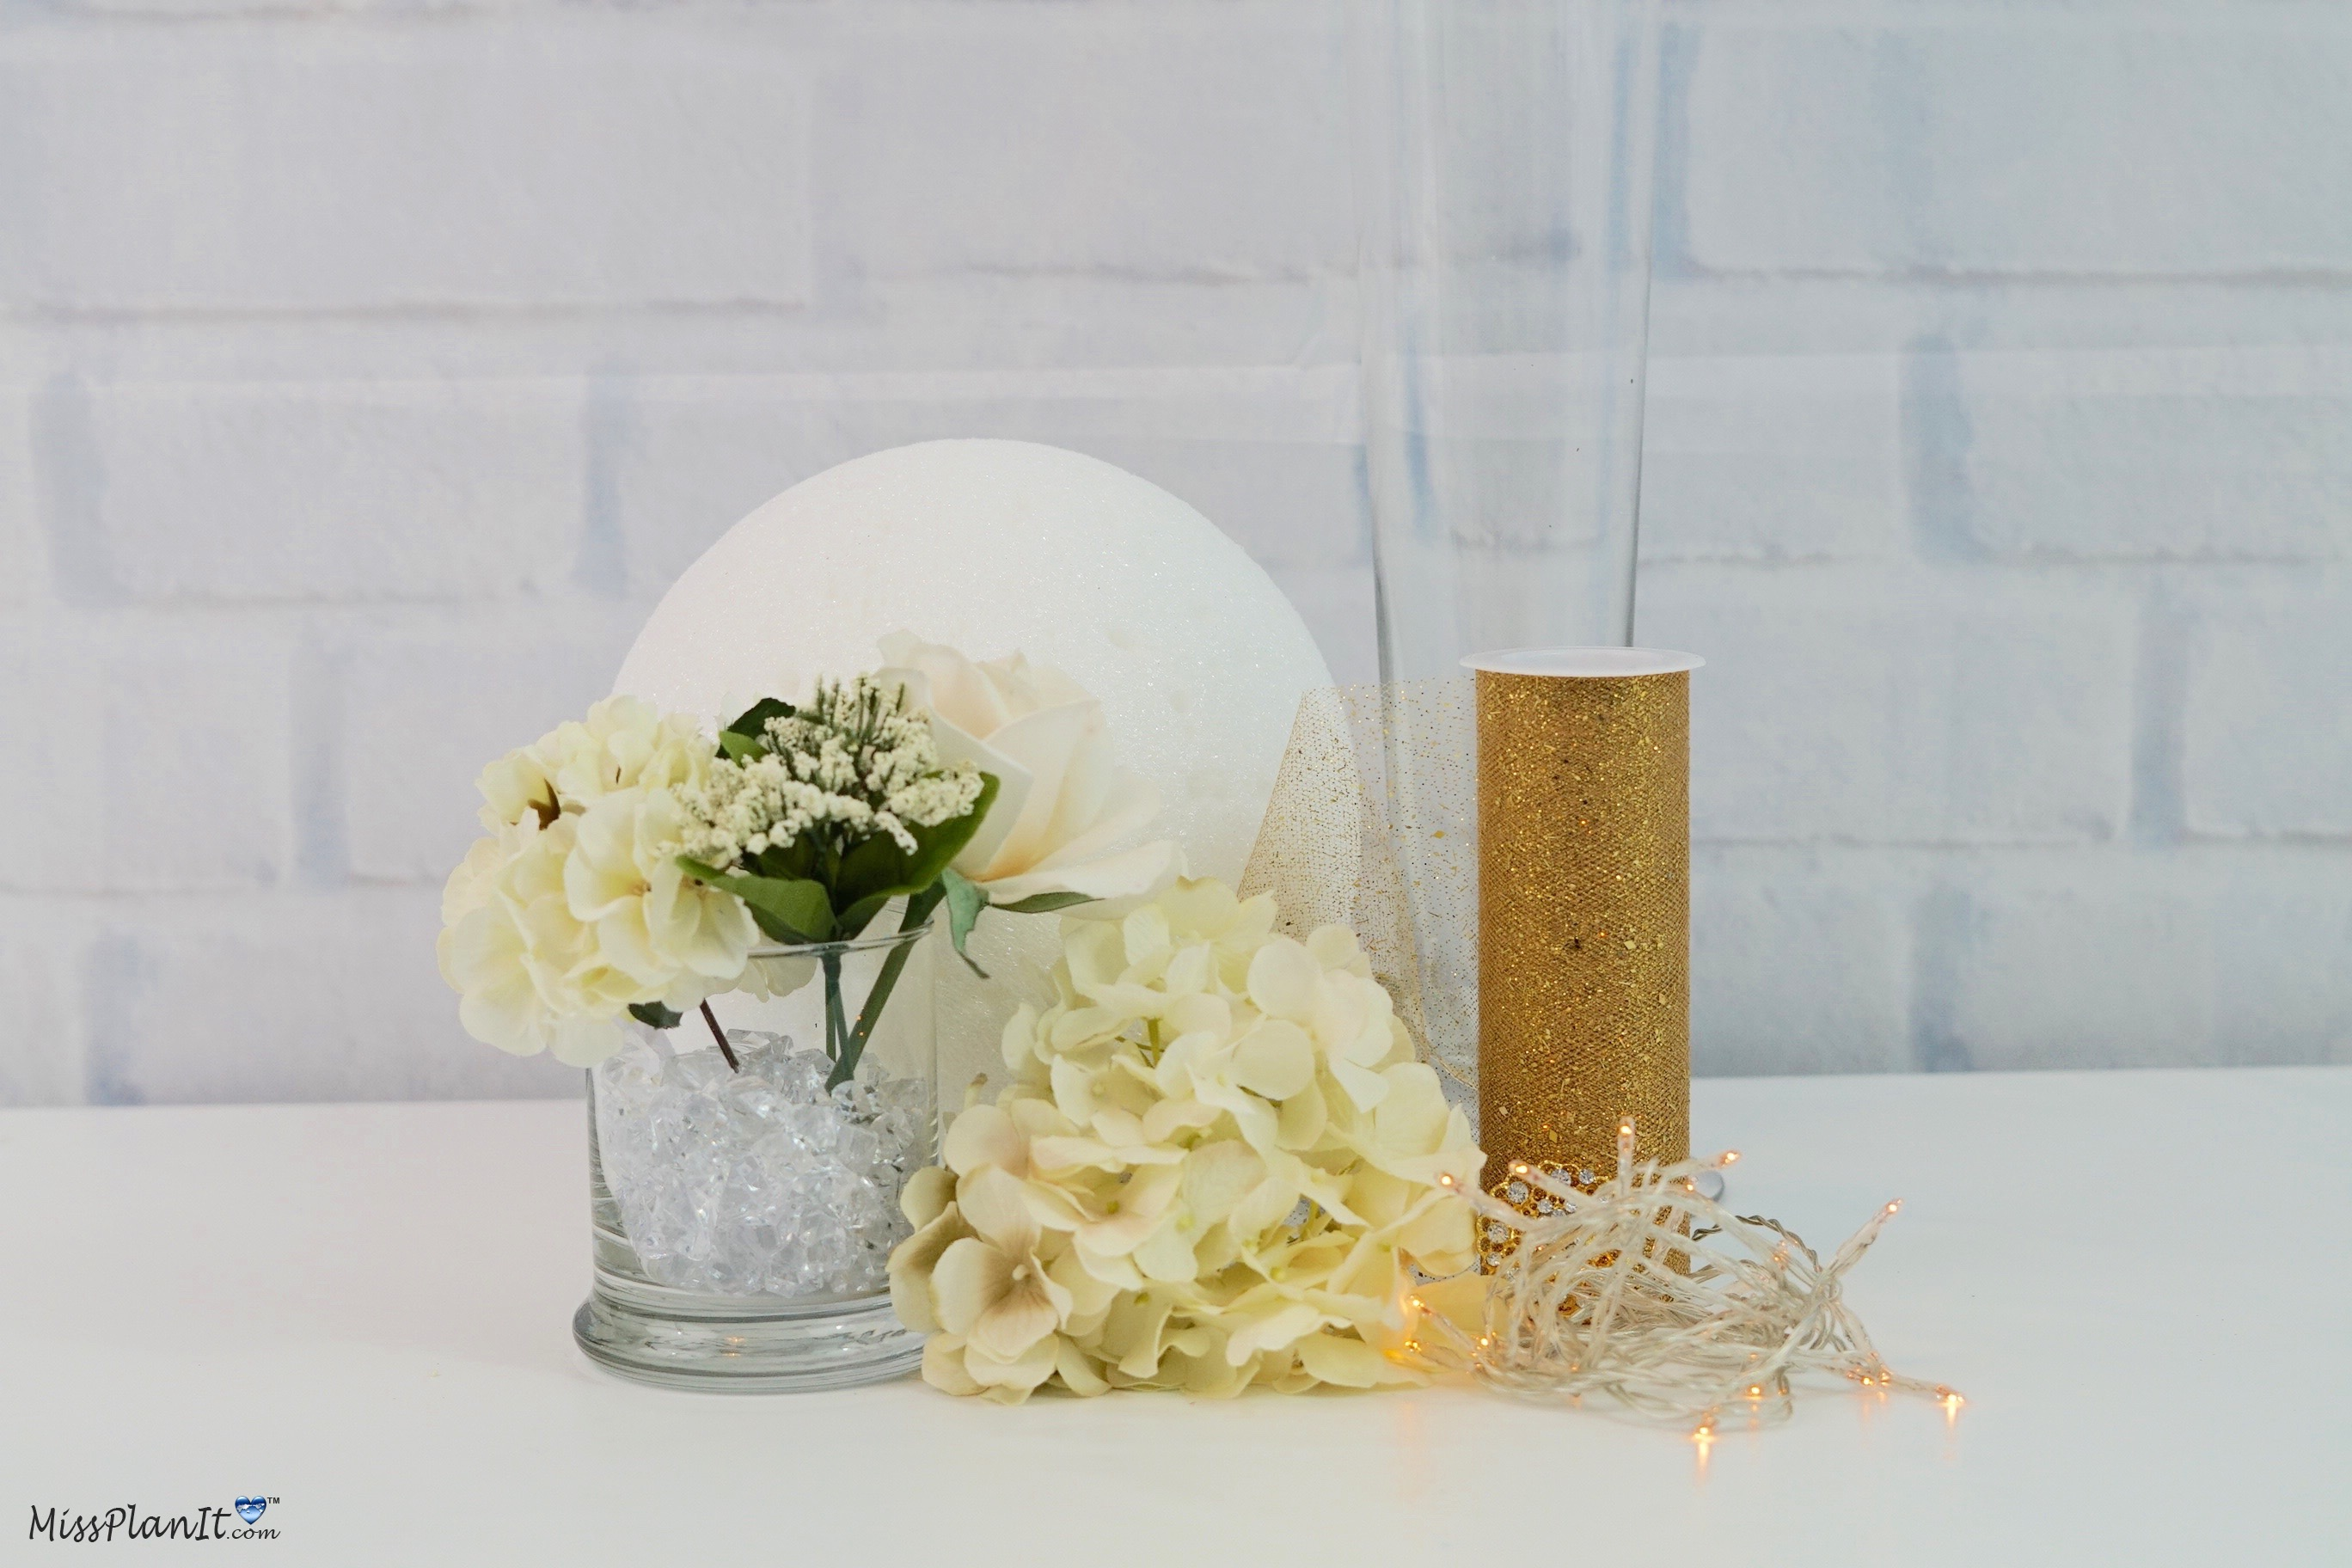 Floracraft Styrofoam Ball-6-inch